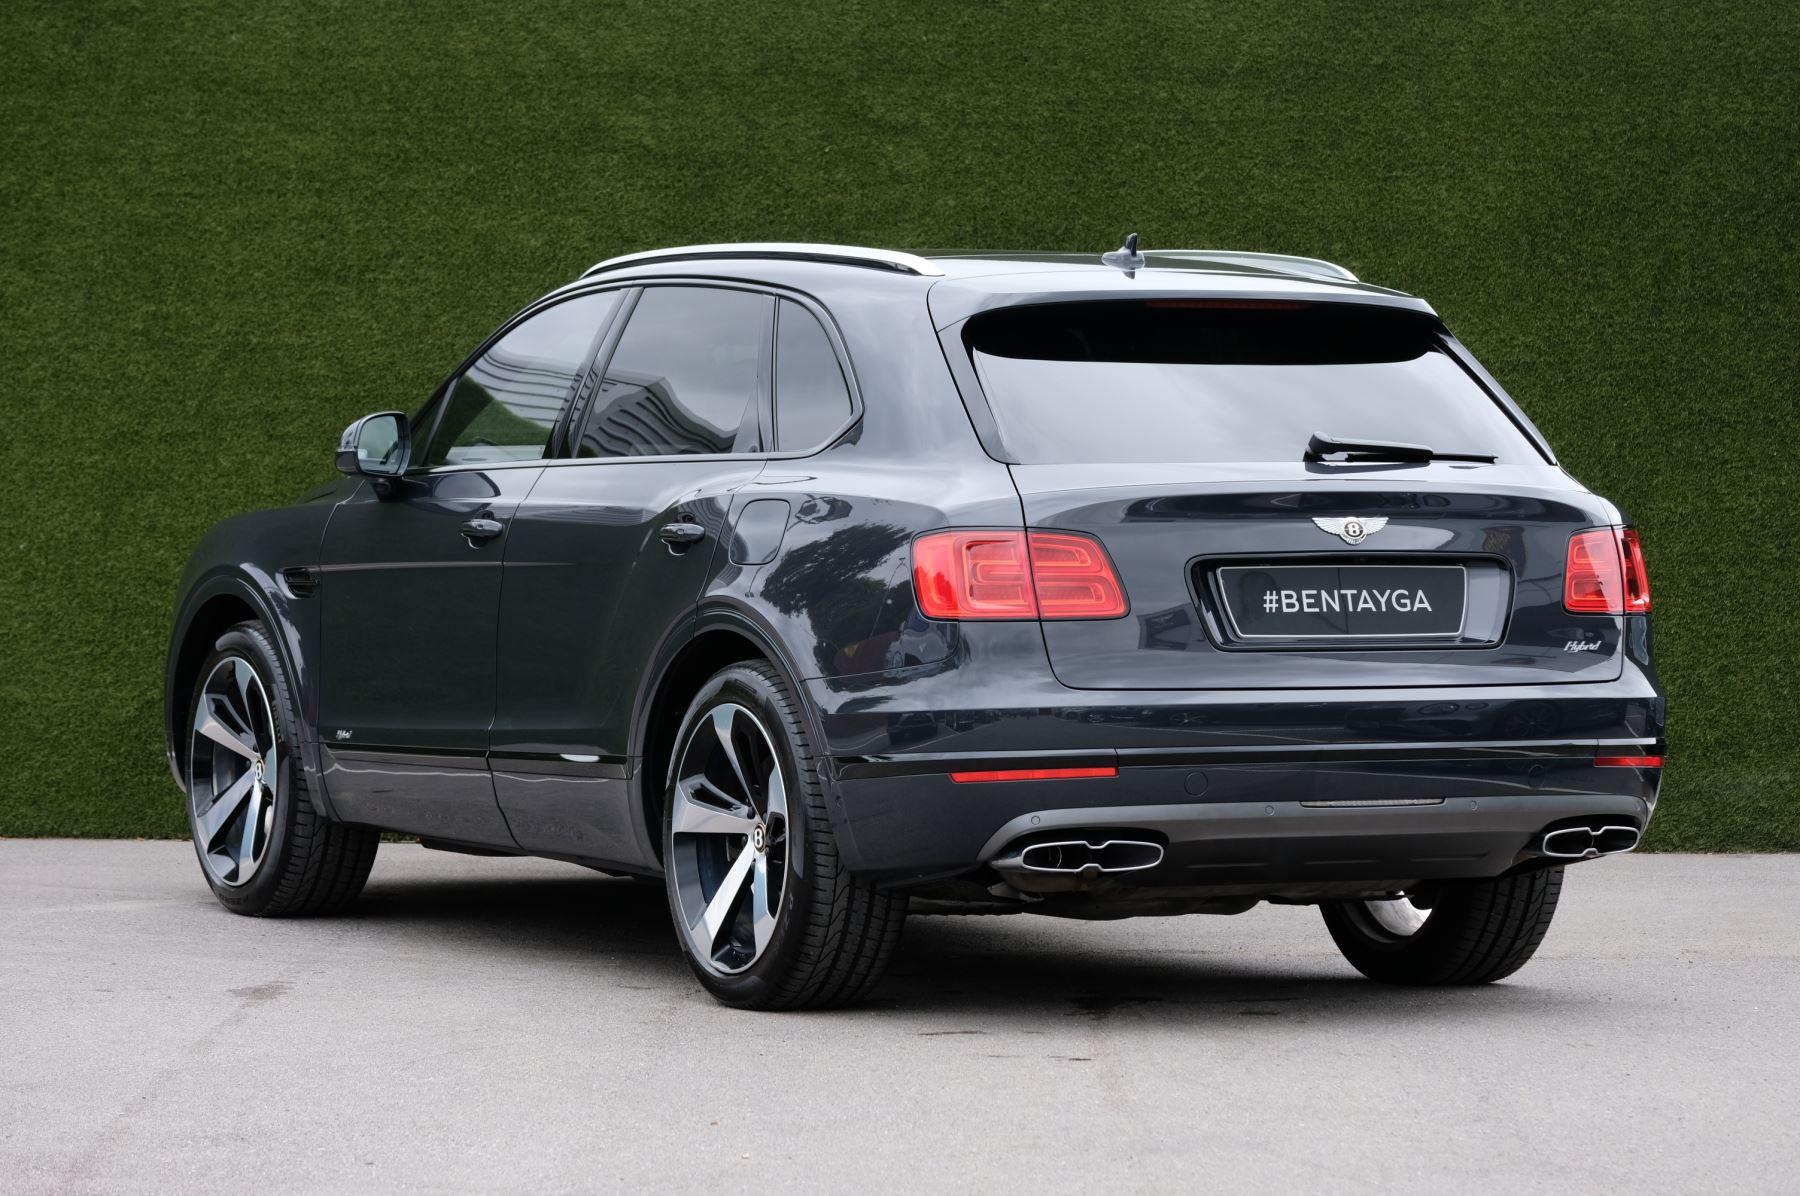 Bentley Bentayga Hybrid 3.0 V6 5dr image 5